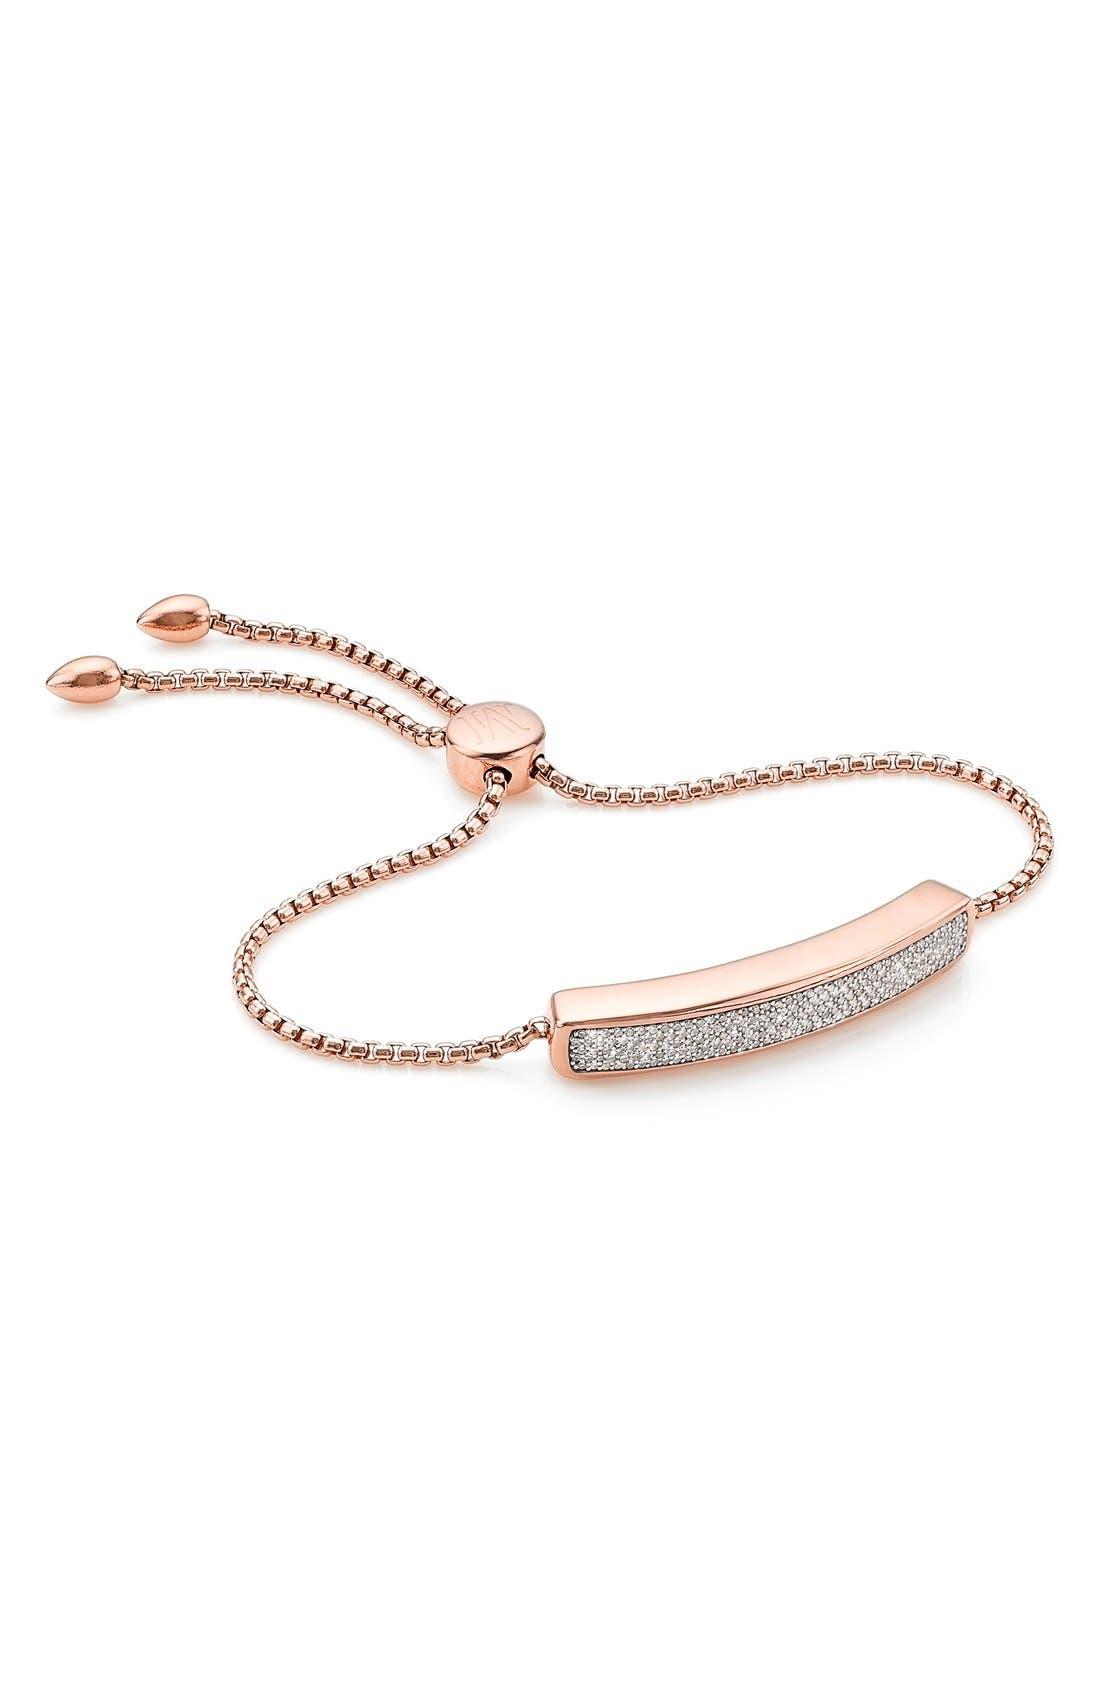 Alternate Image 1 Selected - Monica Vinader Baja Stone Bracelet